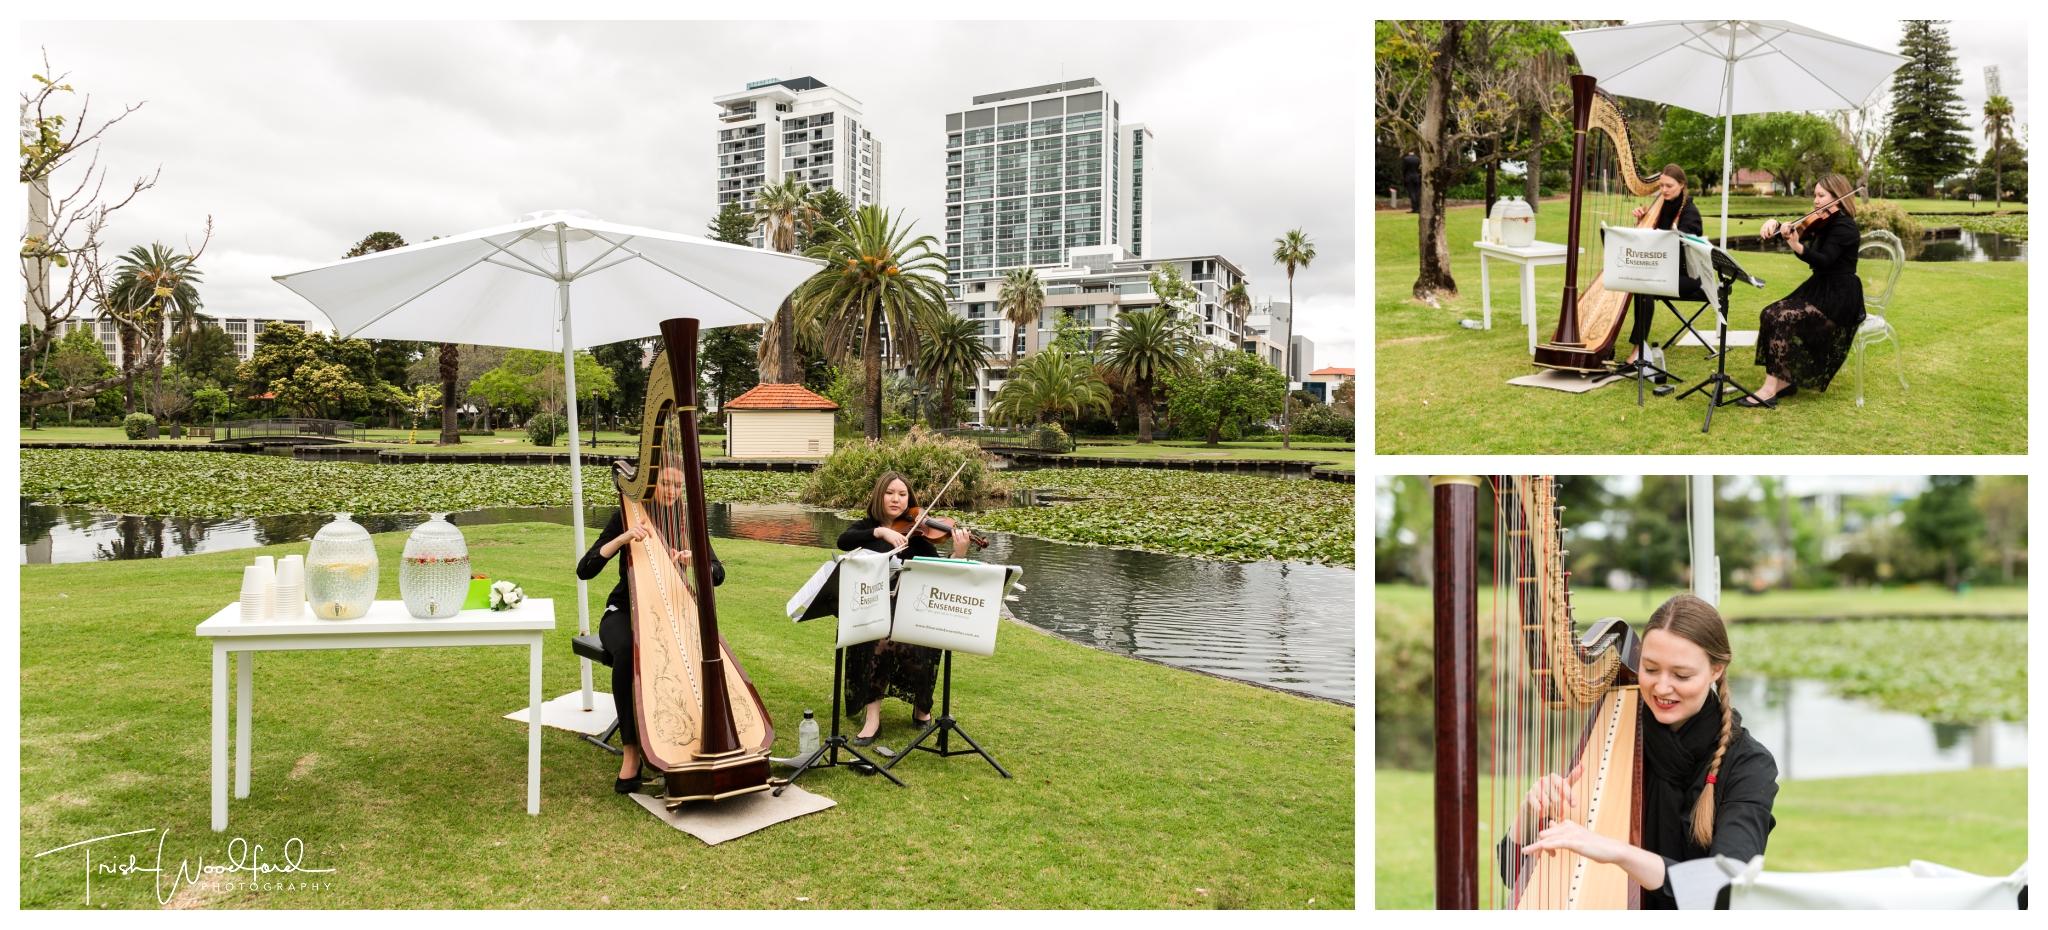 Riverside Ensembles Wedding Musicians